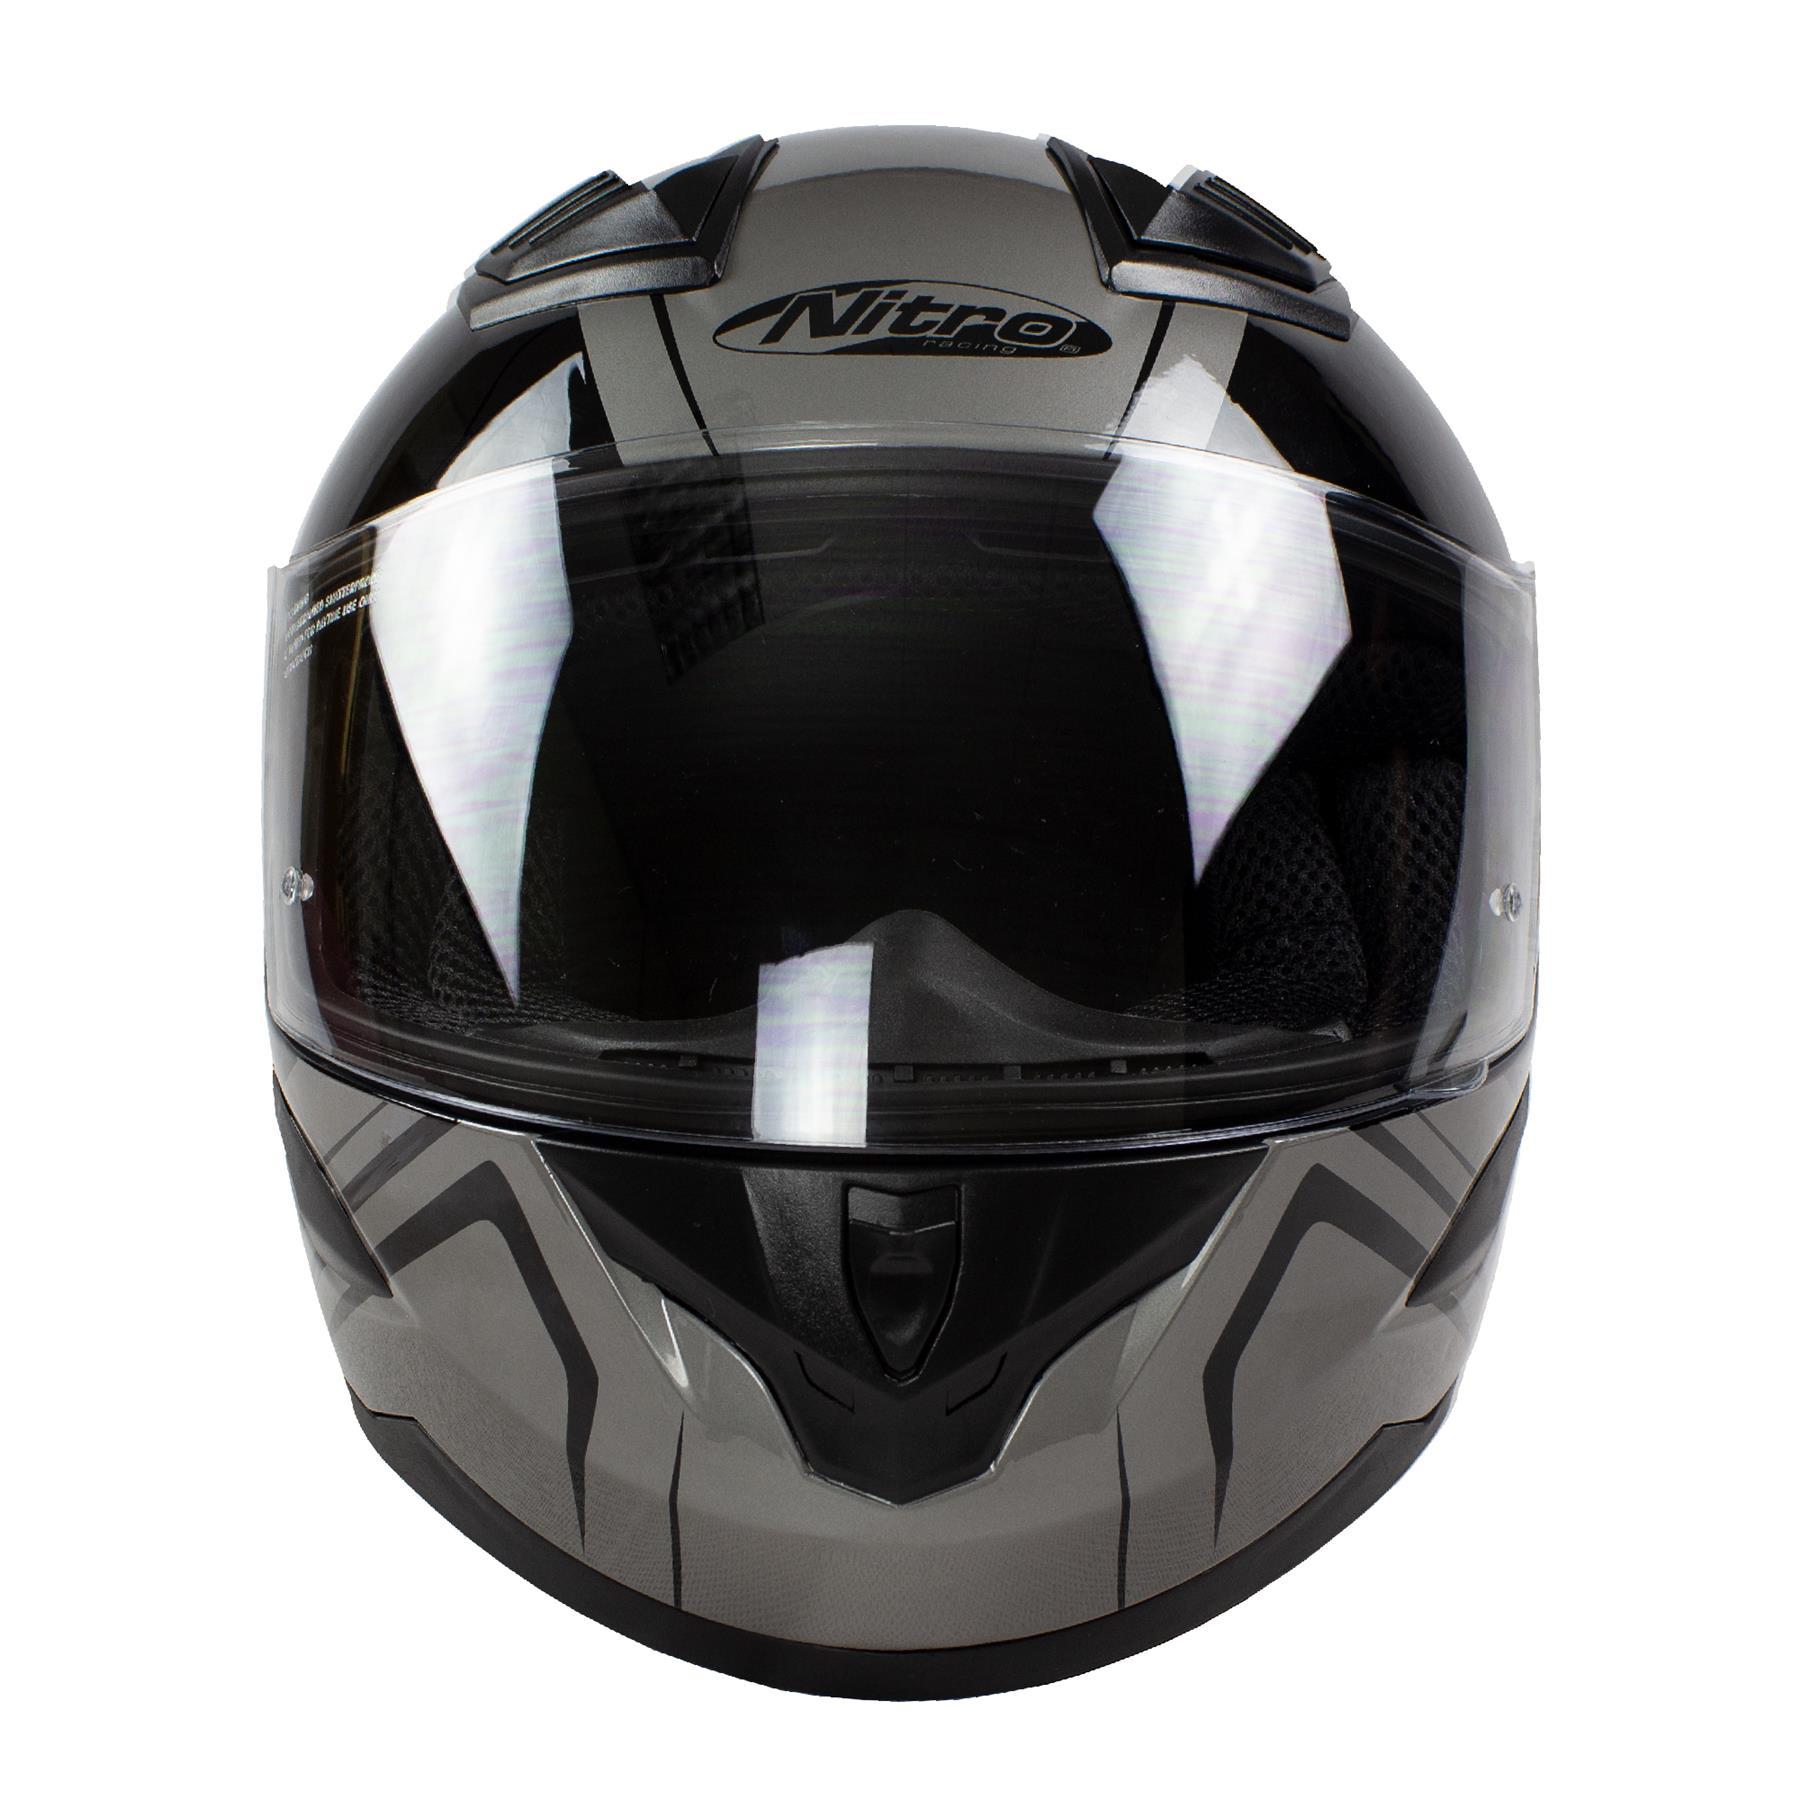 Nitro-N2400-Rogue-Full-Face-Motorcycle-Motorbike-Crash-Helmet-Black-Blue-Red thumbnail 18